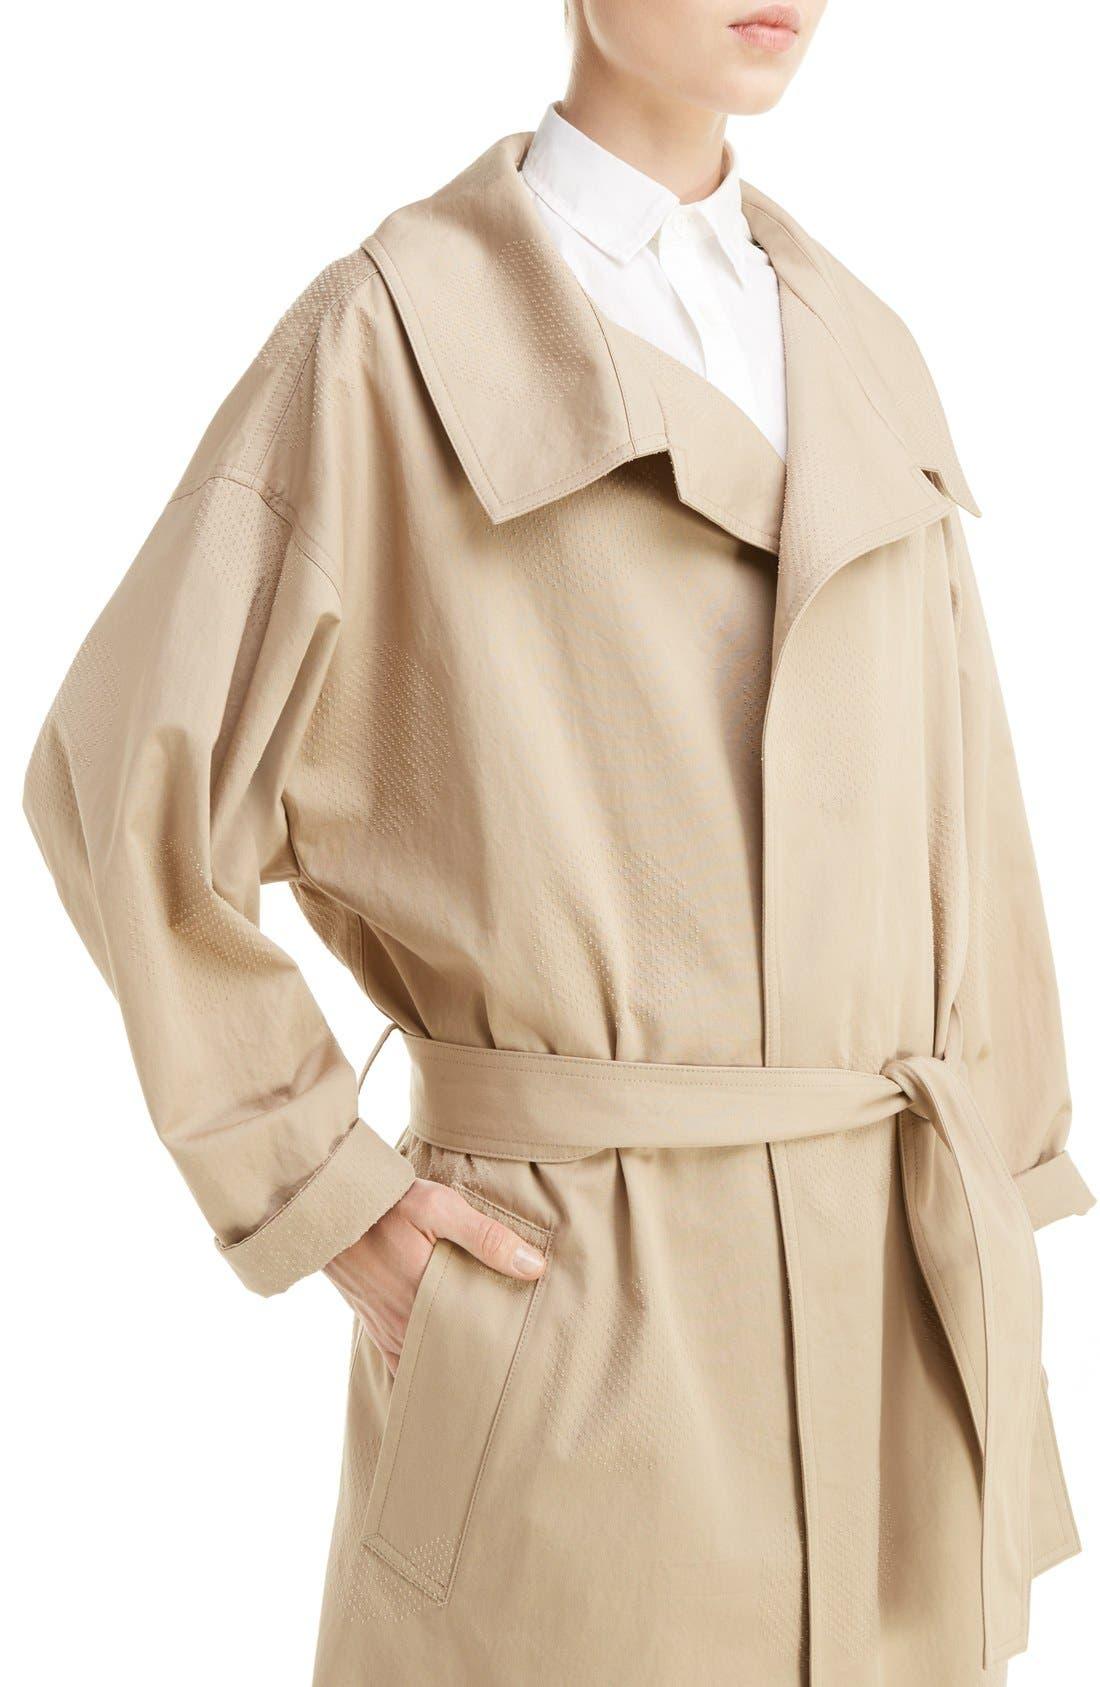 U-Gown Coat,                             Alternate thumbnail 5, color,                             250